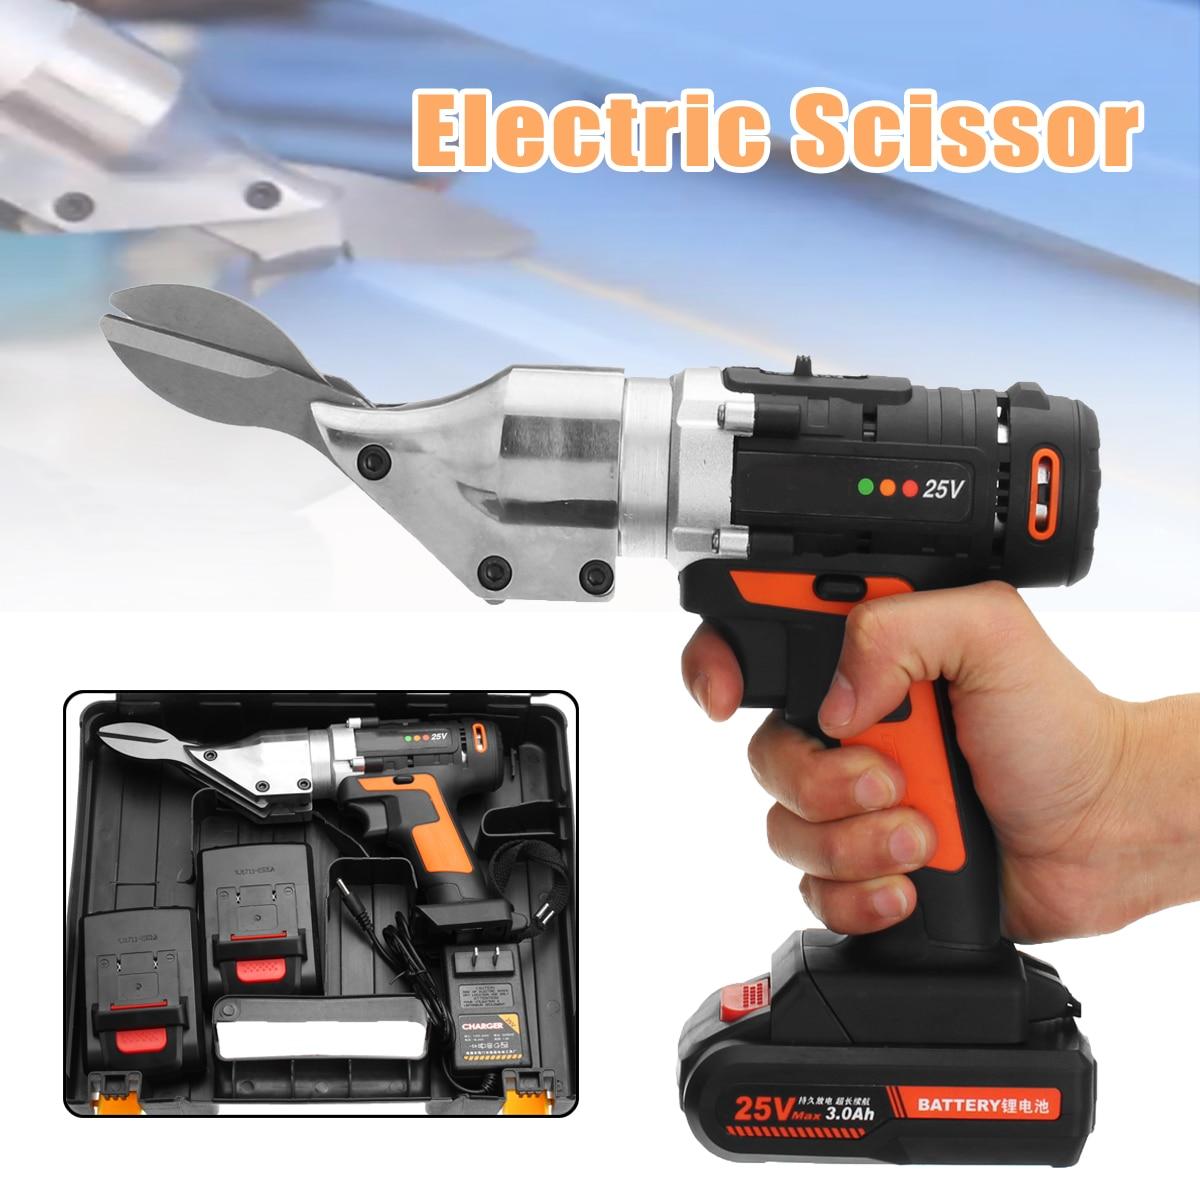 25V Li-ion Cordless Electric Scissor Metal Sheet Shear Cutter Scissors Rechargeable 2 Battery Rotating Head Power Tool